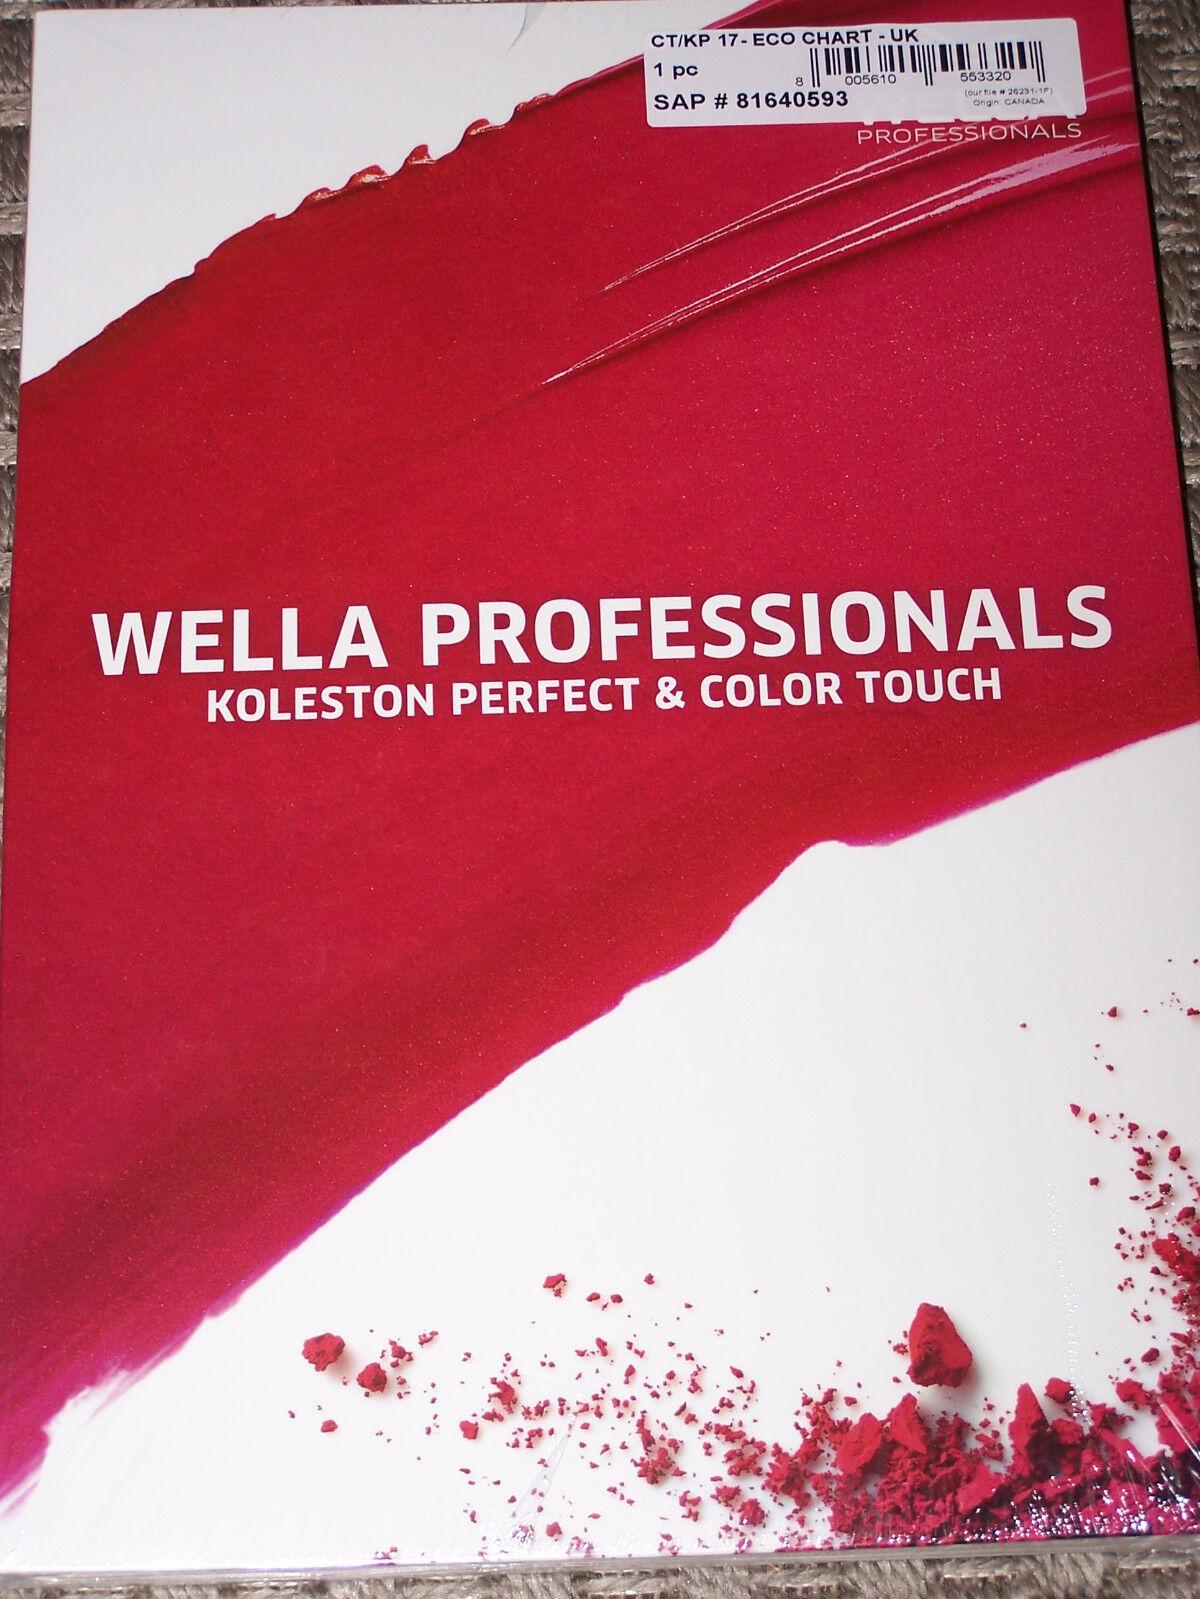 Wella Koleston And Colortouch Combo Chart 2017 2018 Ebay